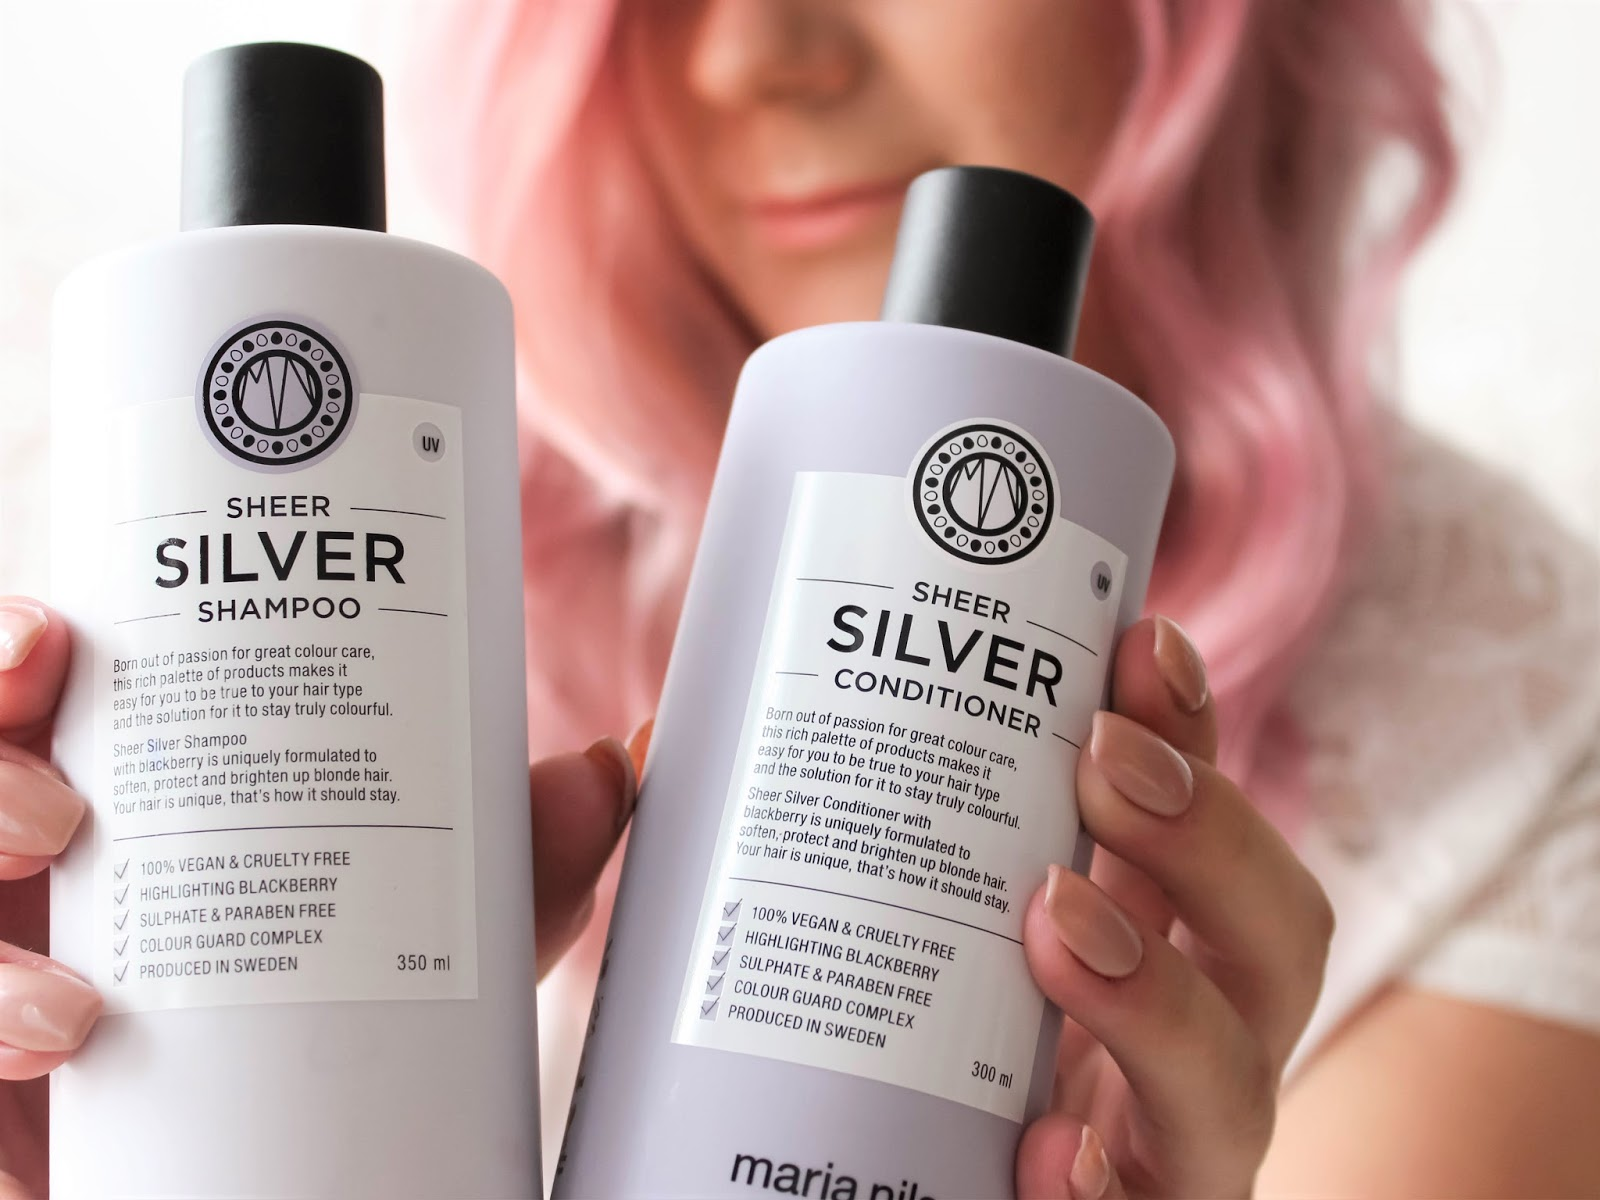 šampon a kondicionér sheer silver